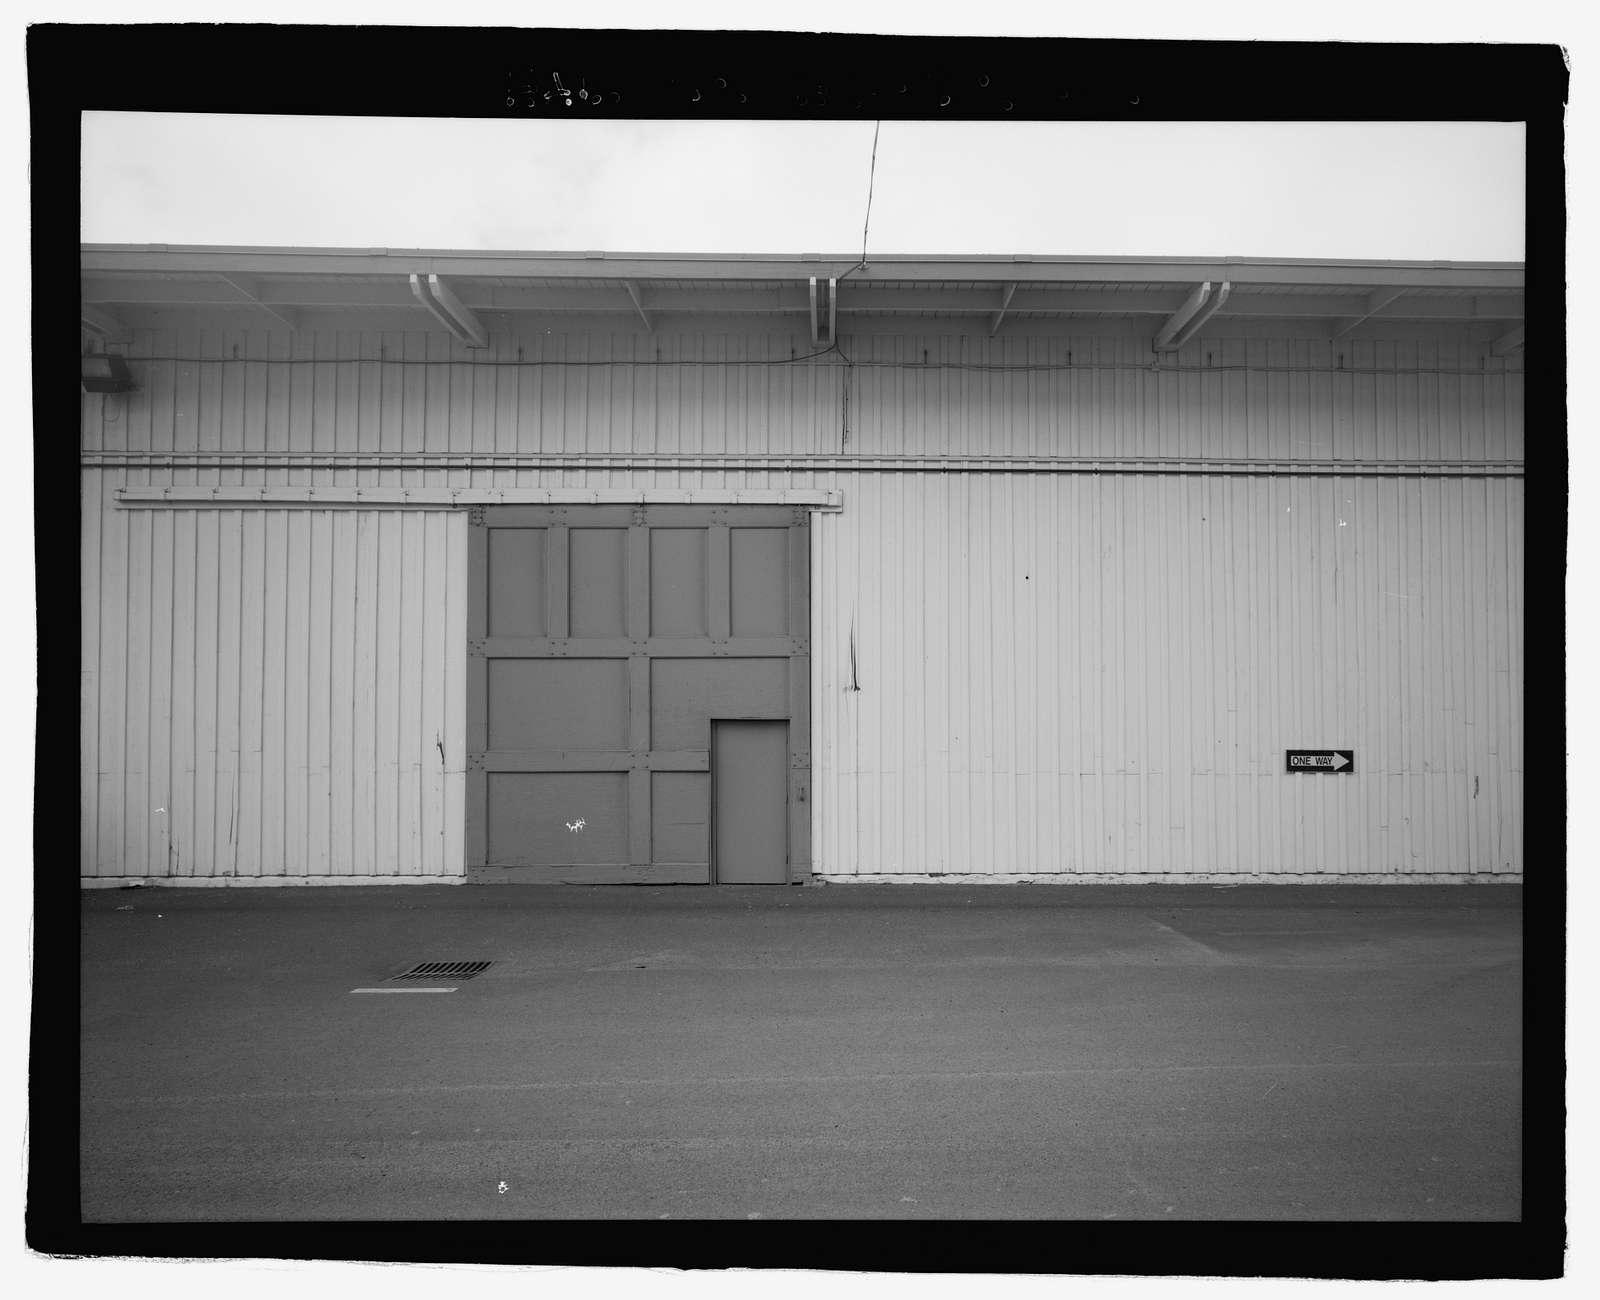 U.S. Naval Base, Pearl Harbor, Waterfront Transit Shed, Corner of Gaffney Street & Astoria Avenue along Wharf K11, Pearl City, Honolulu County, HI